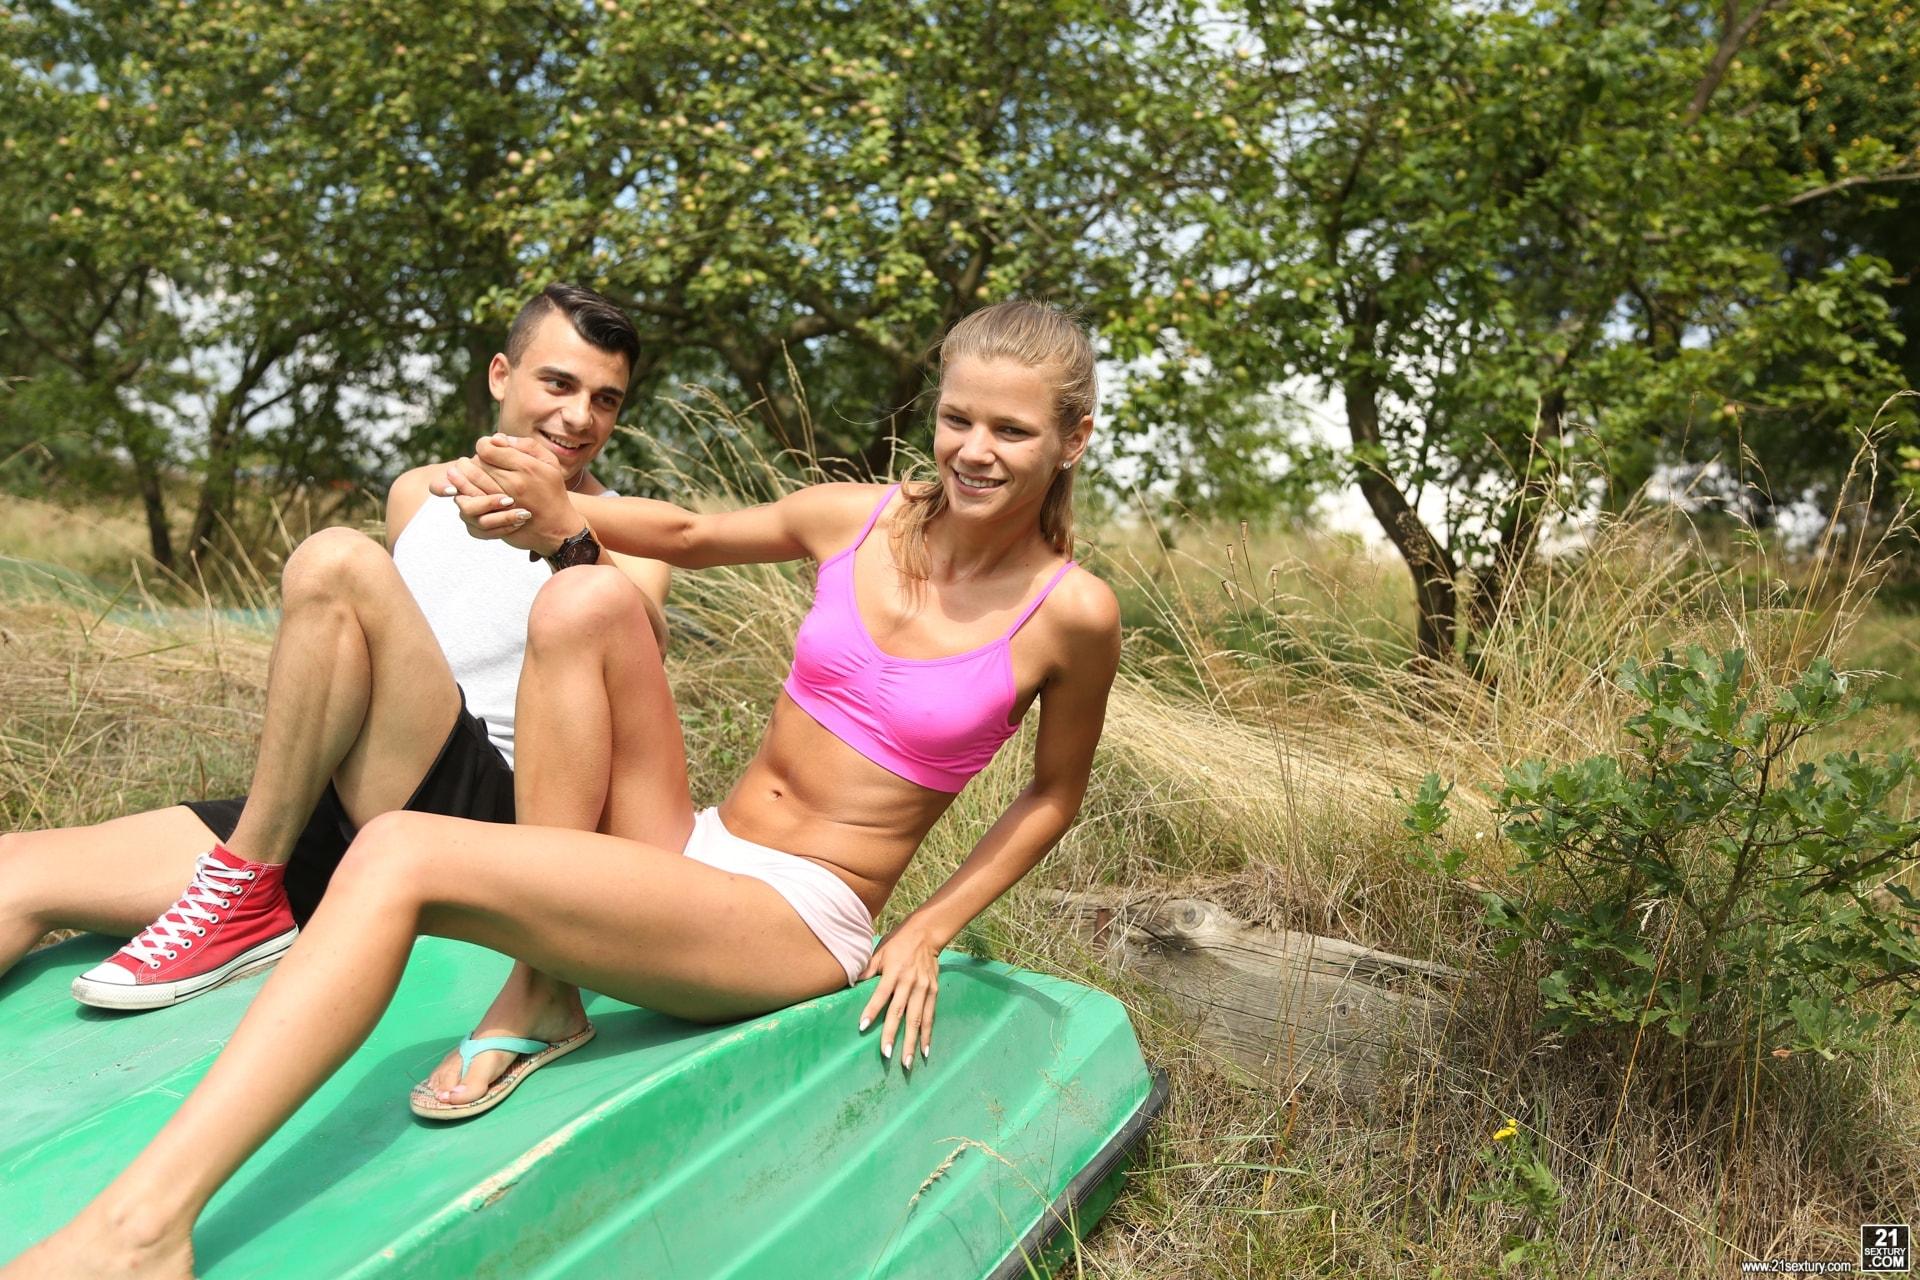 21Sextury 'House Boat Full of Teens' starring Sara Kay (Photo 6)